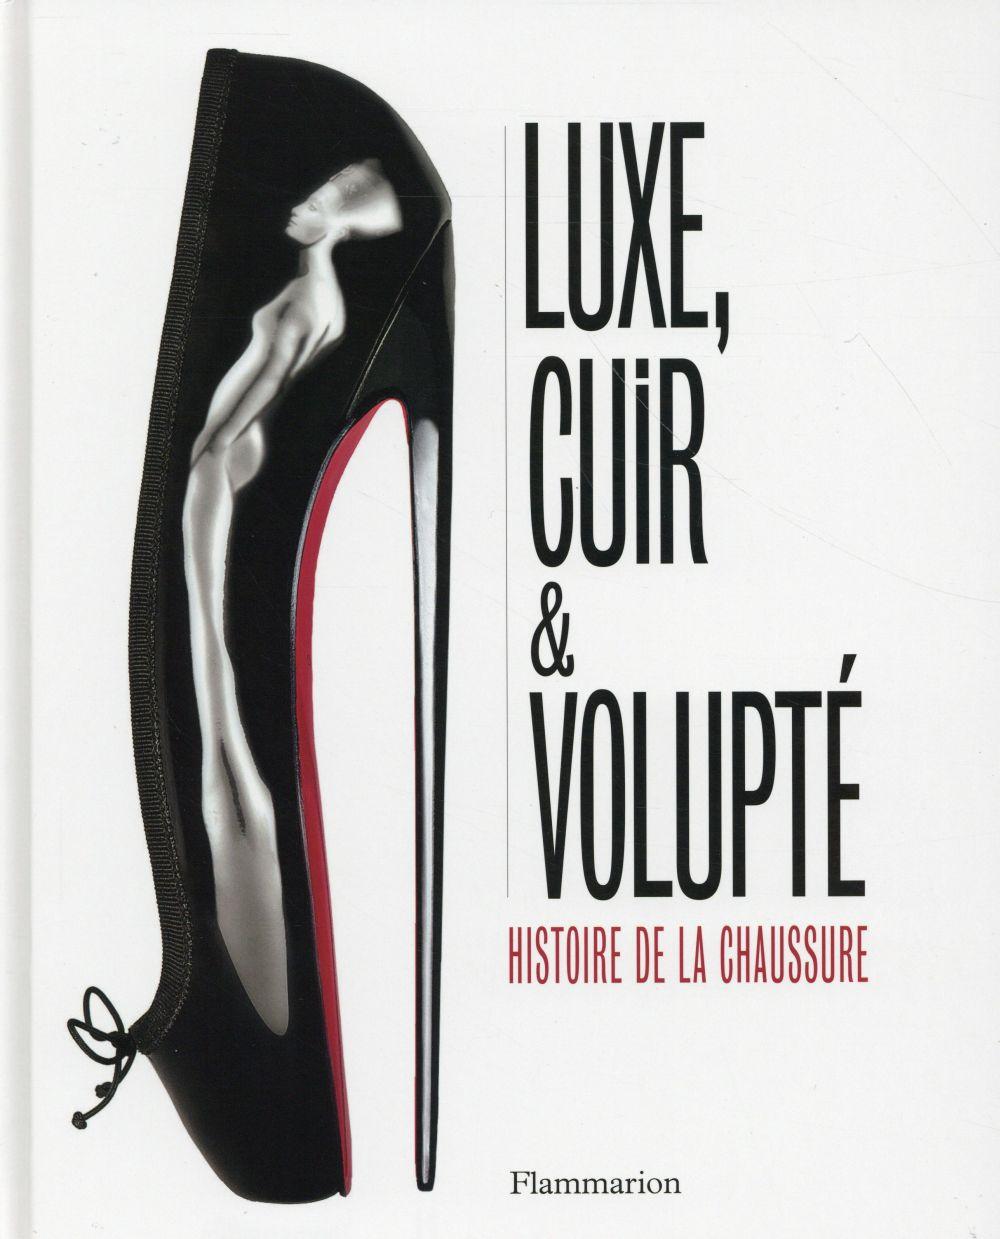 LUXE, CUIR ET VOLUPTE - HISTOIRE DE LA CHAUSSURE RENAUDIN, Flammarion